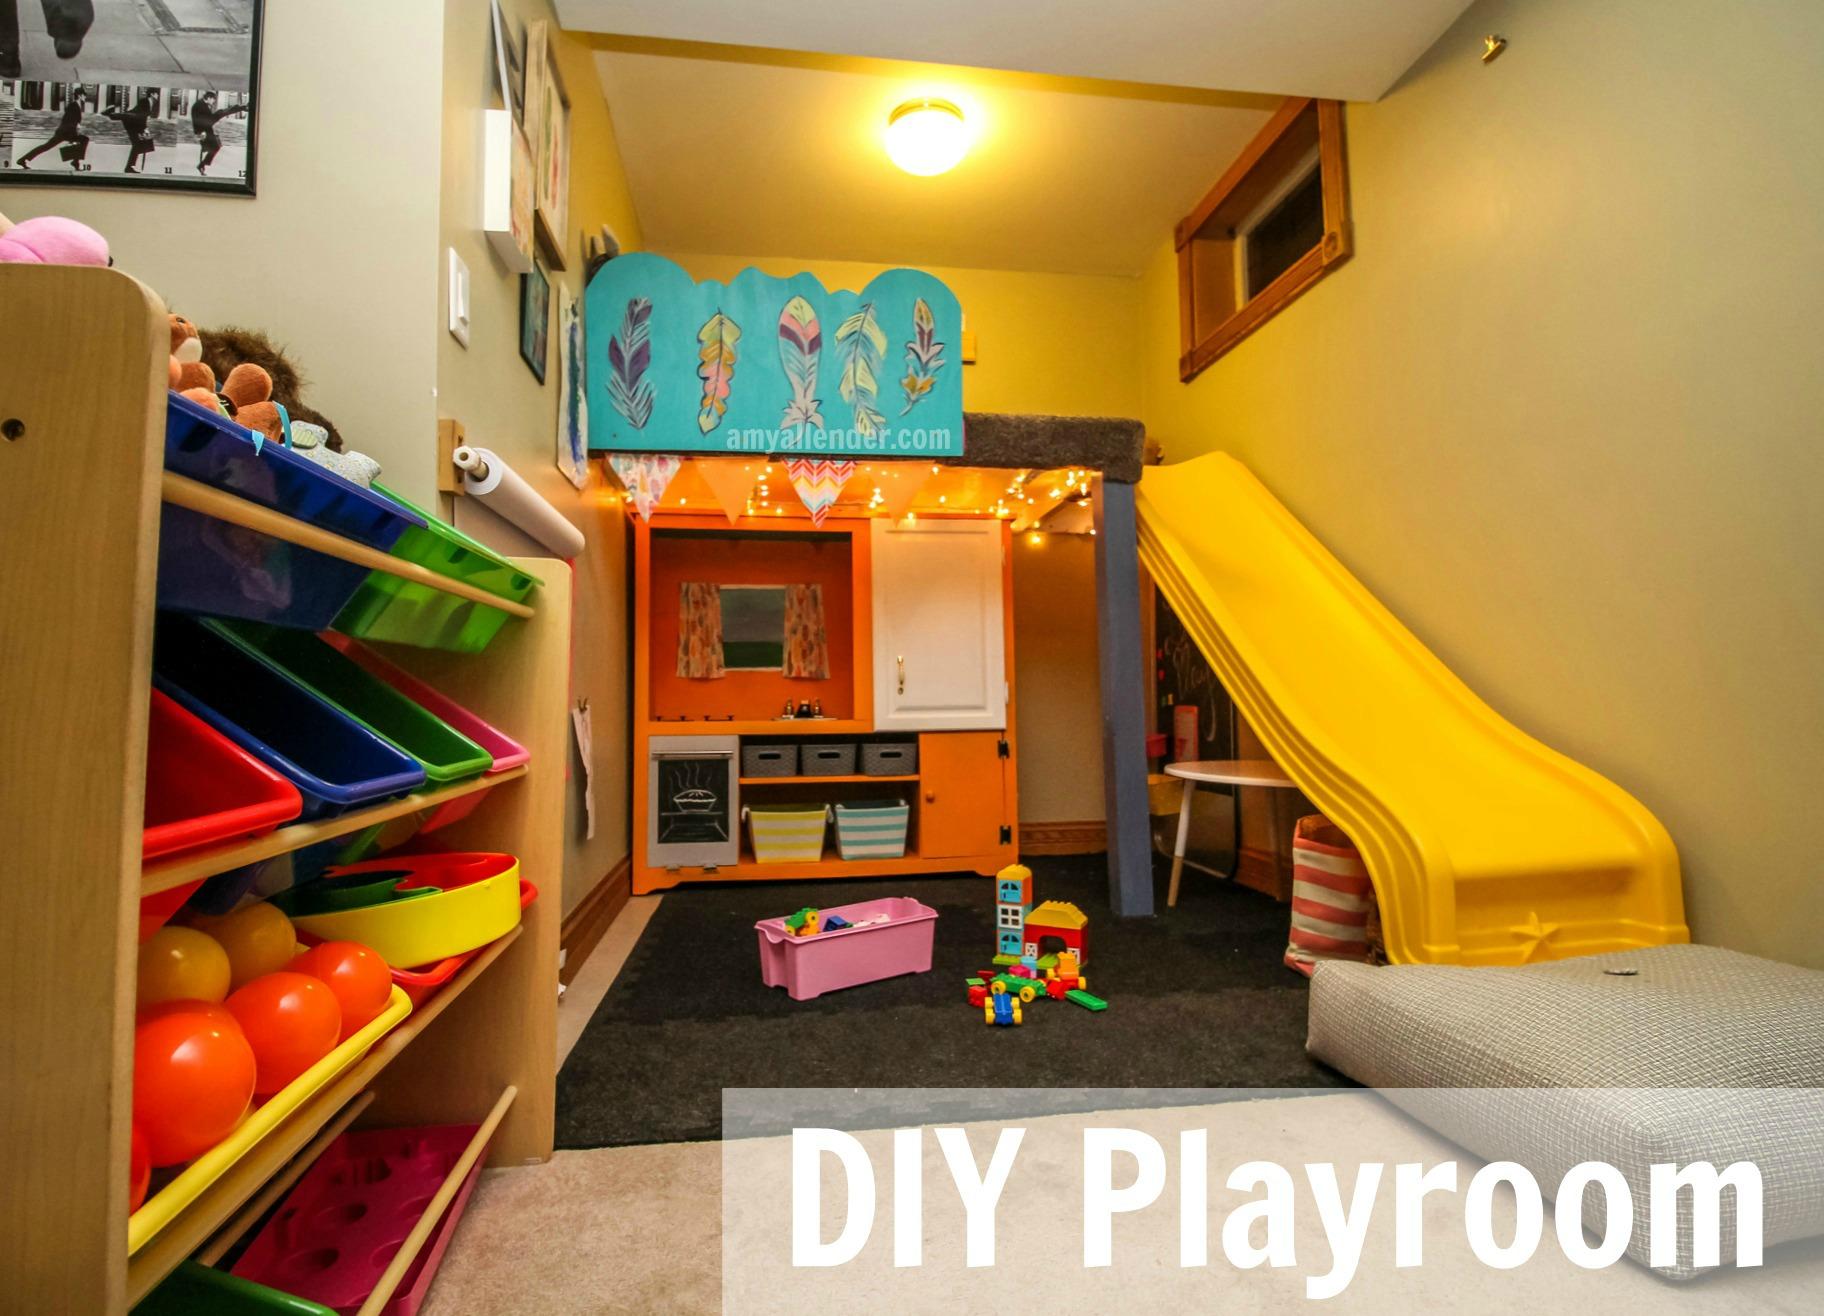 DIY Playroom